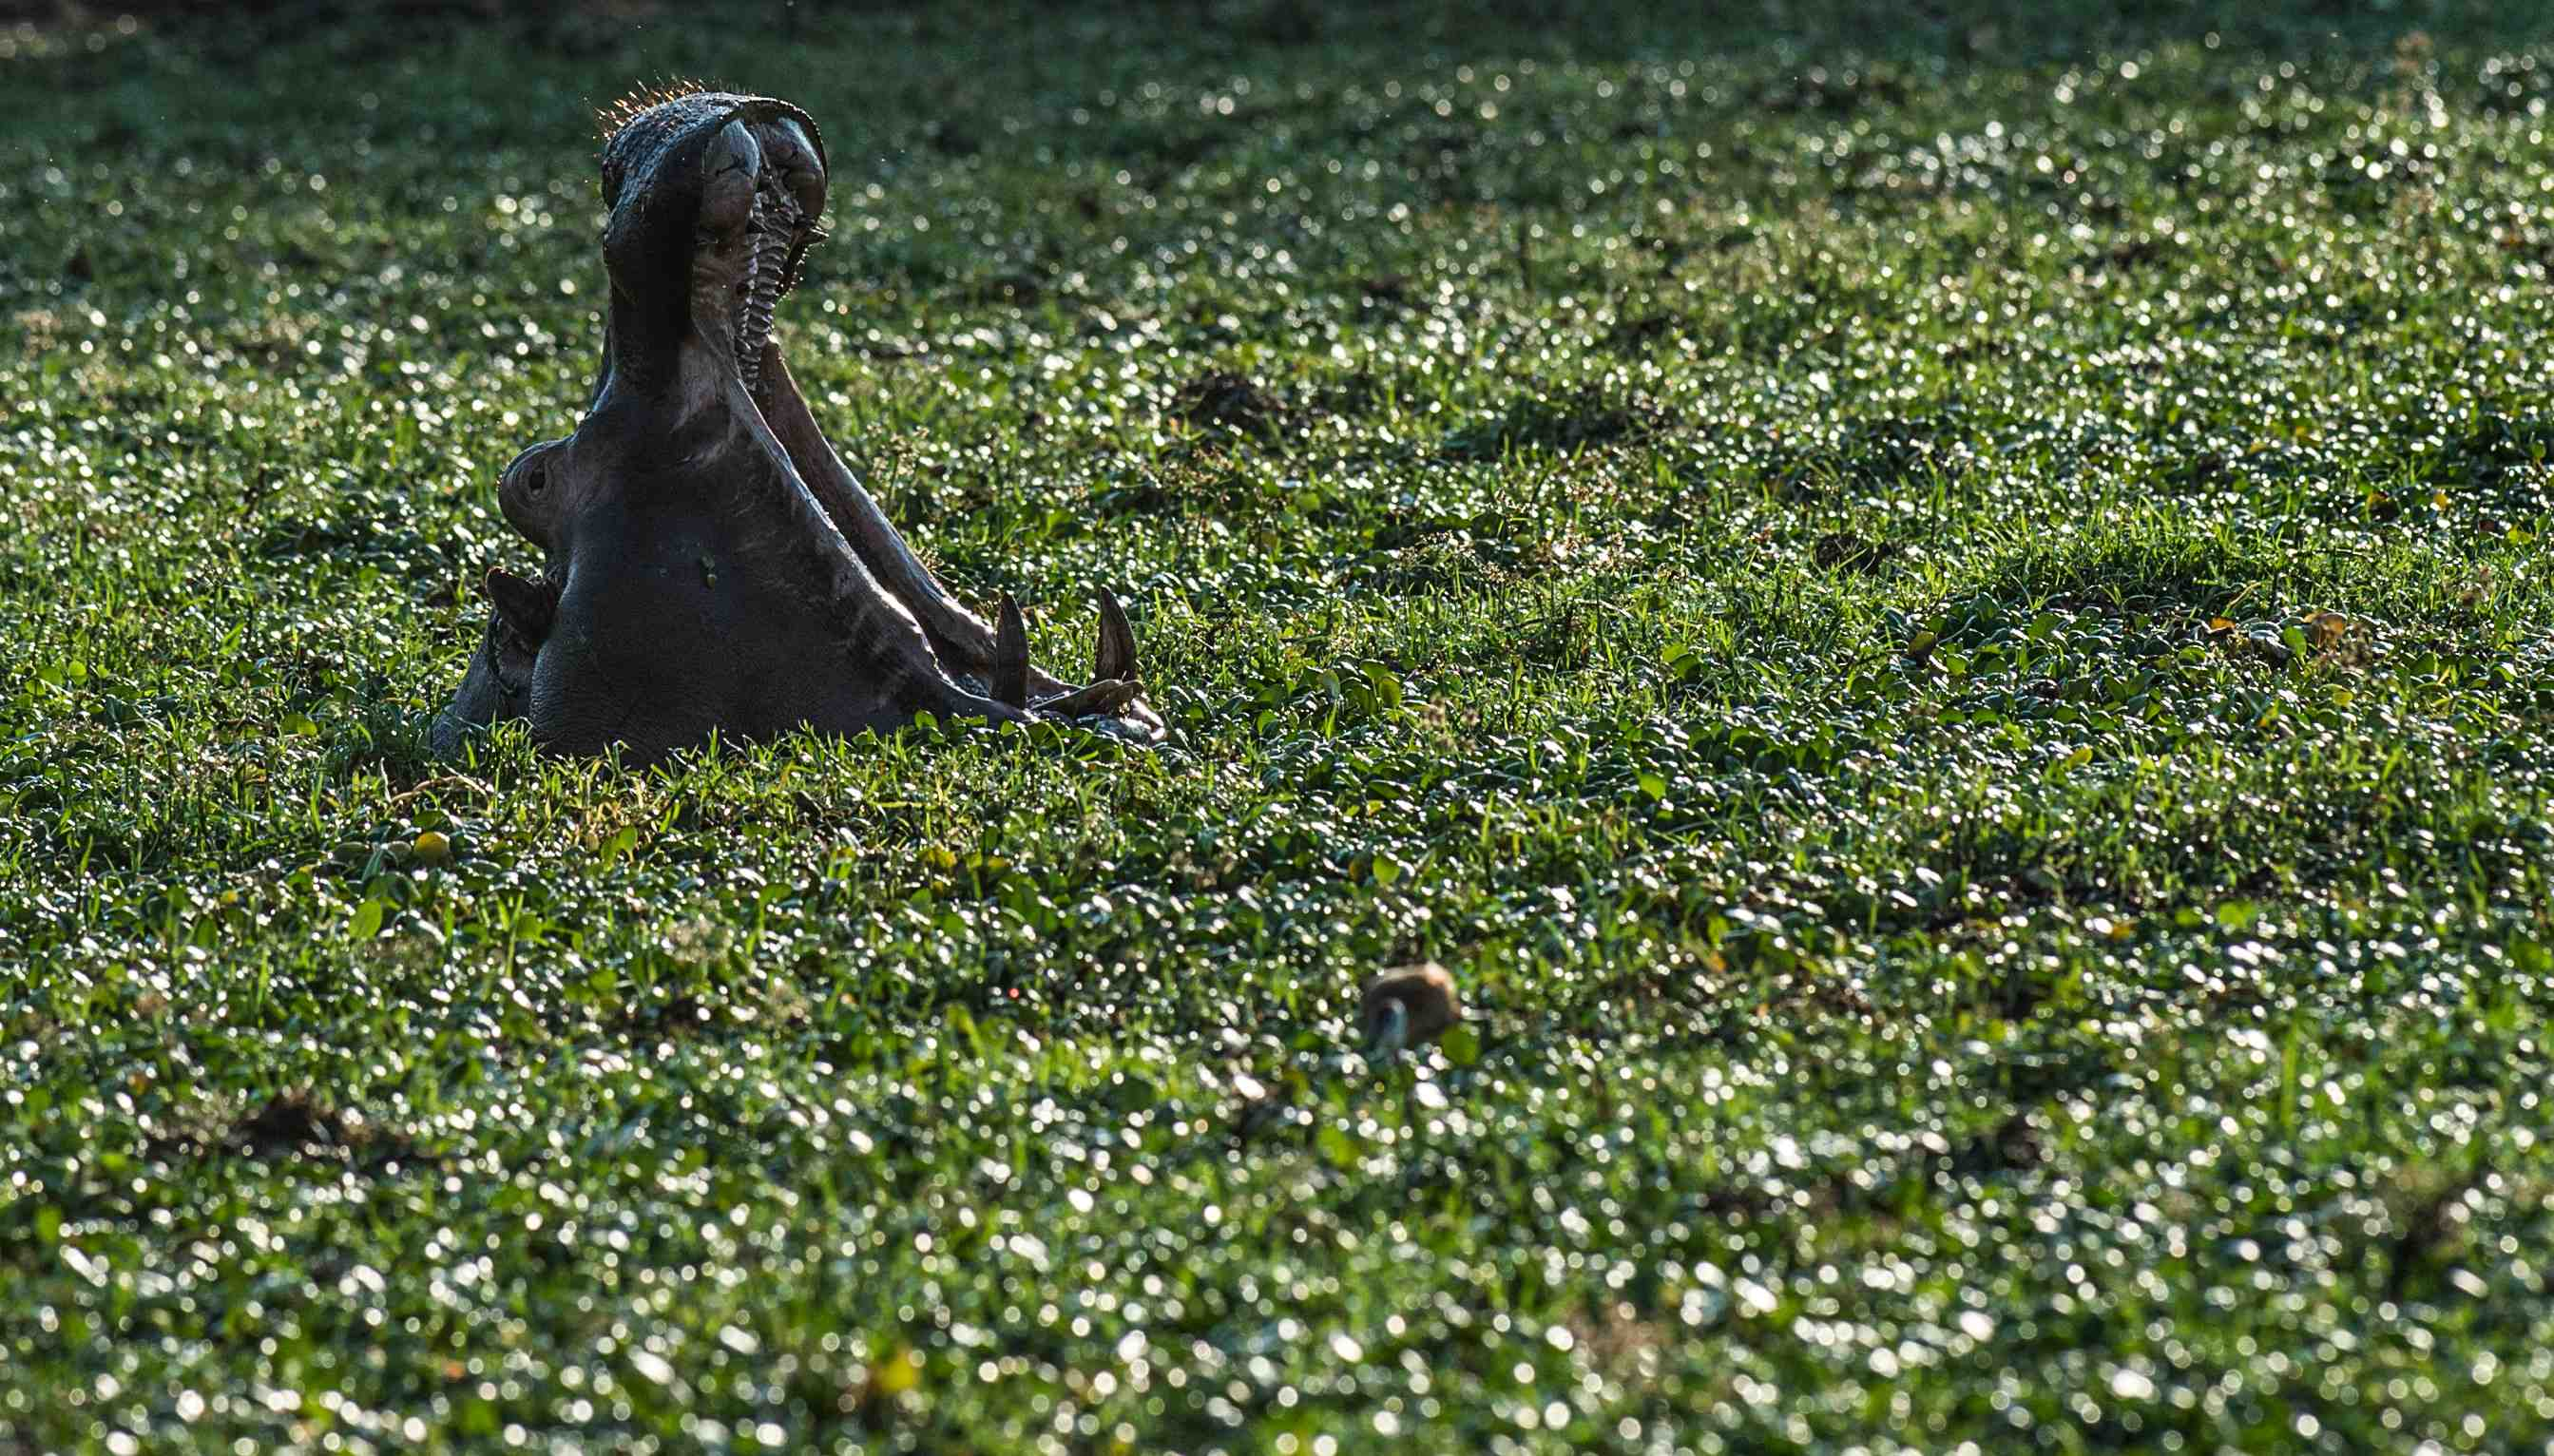 David Yarrow Hippos in Zambia